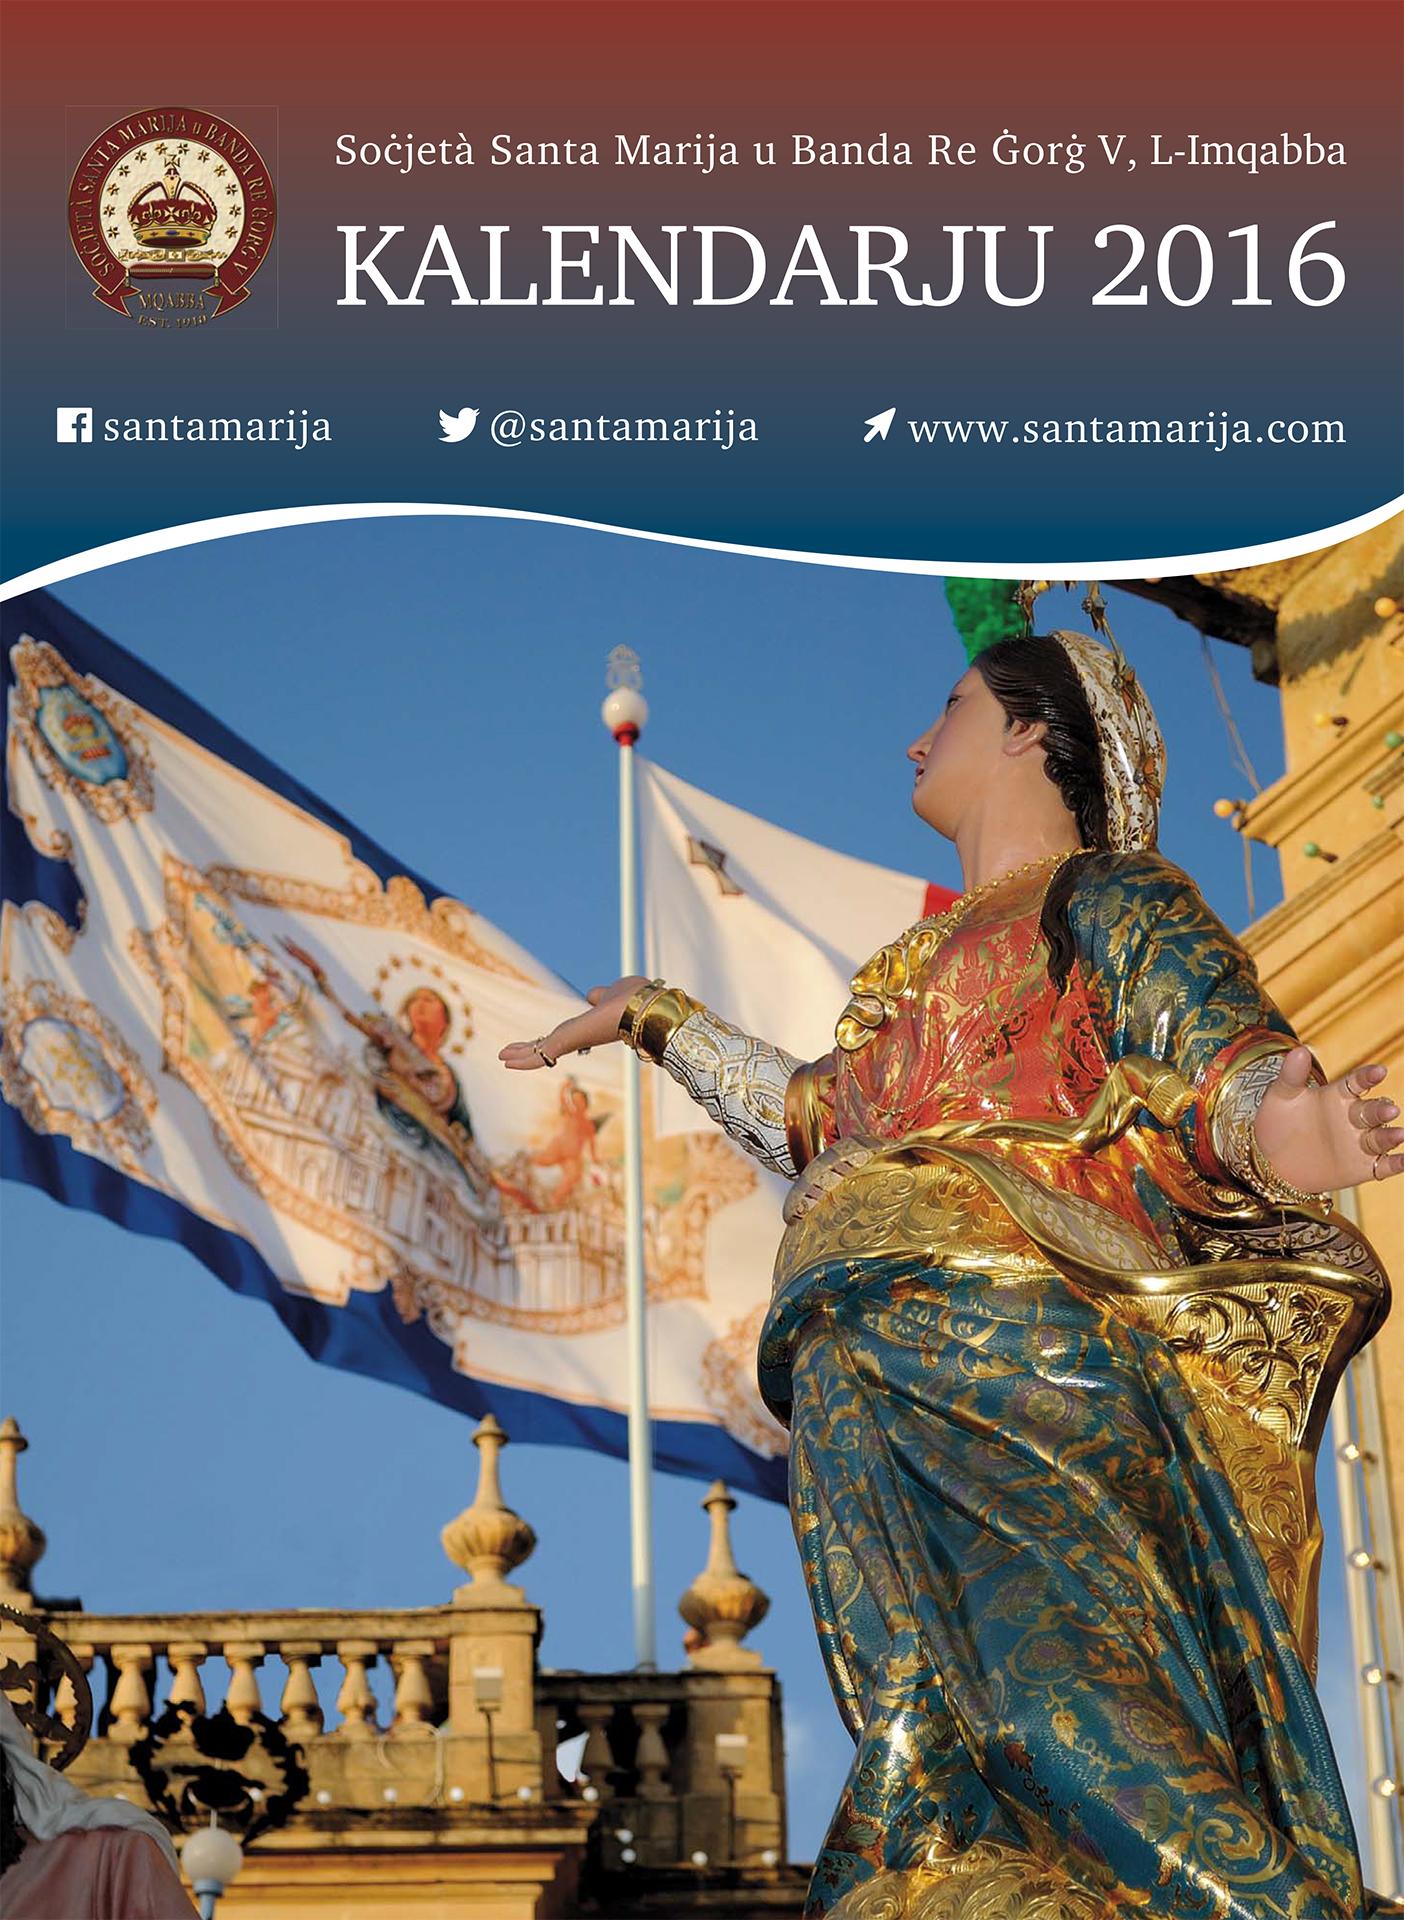 Kalendarju 2016